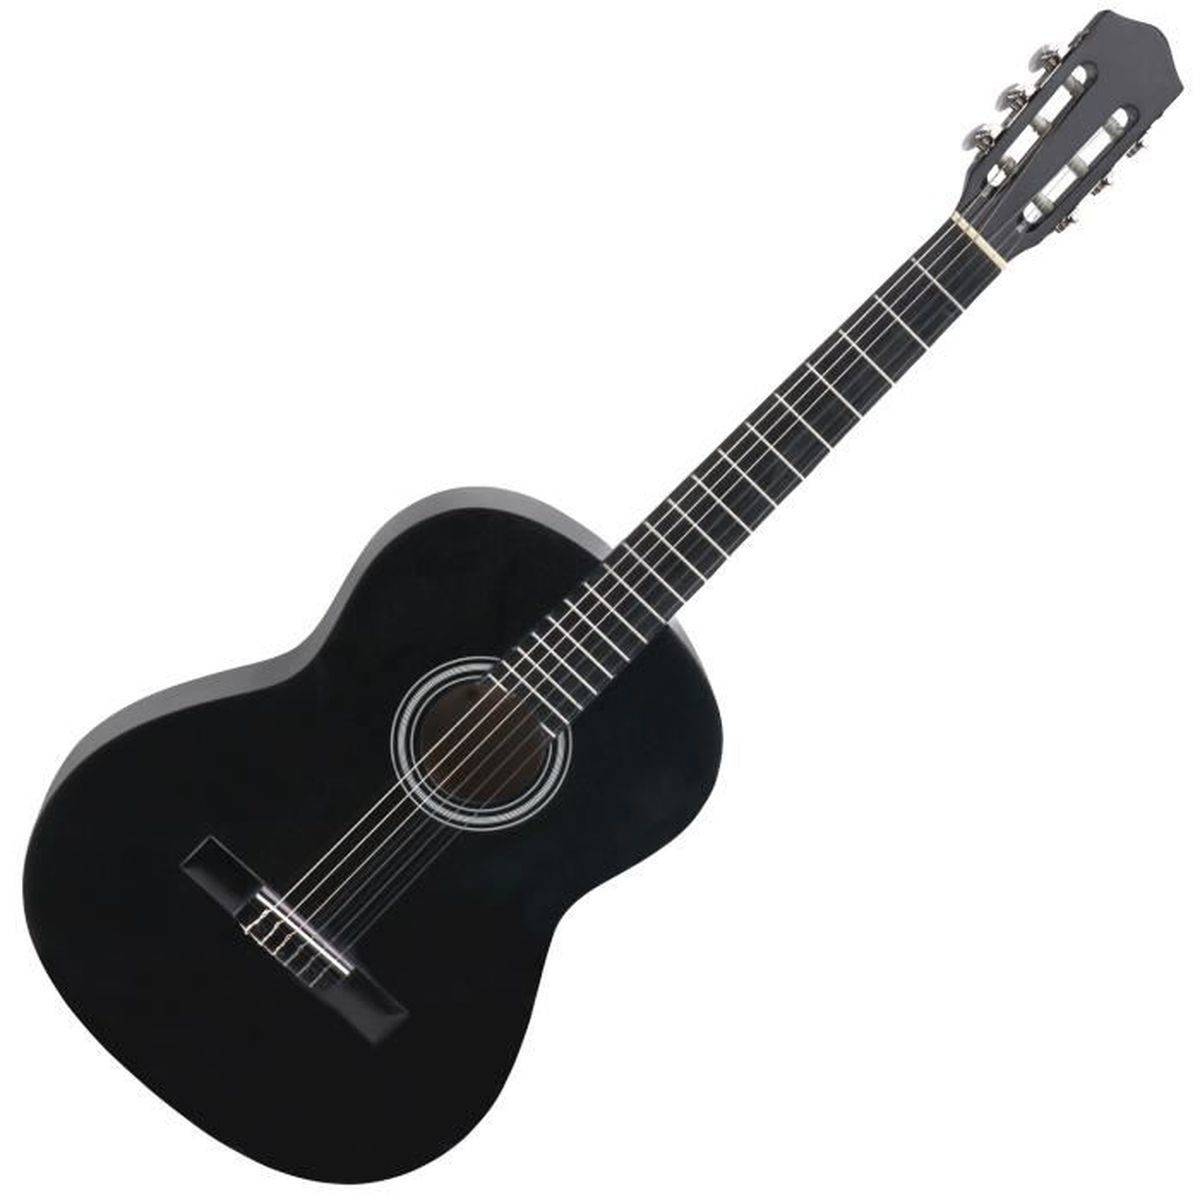 GUITARE Calida Benita CB34BK Guitare Classique 3/4 noir